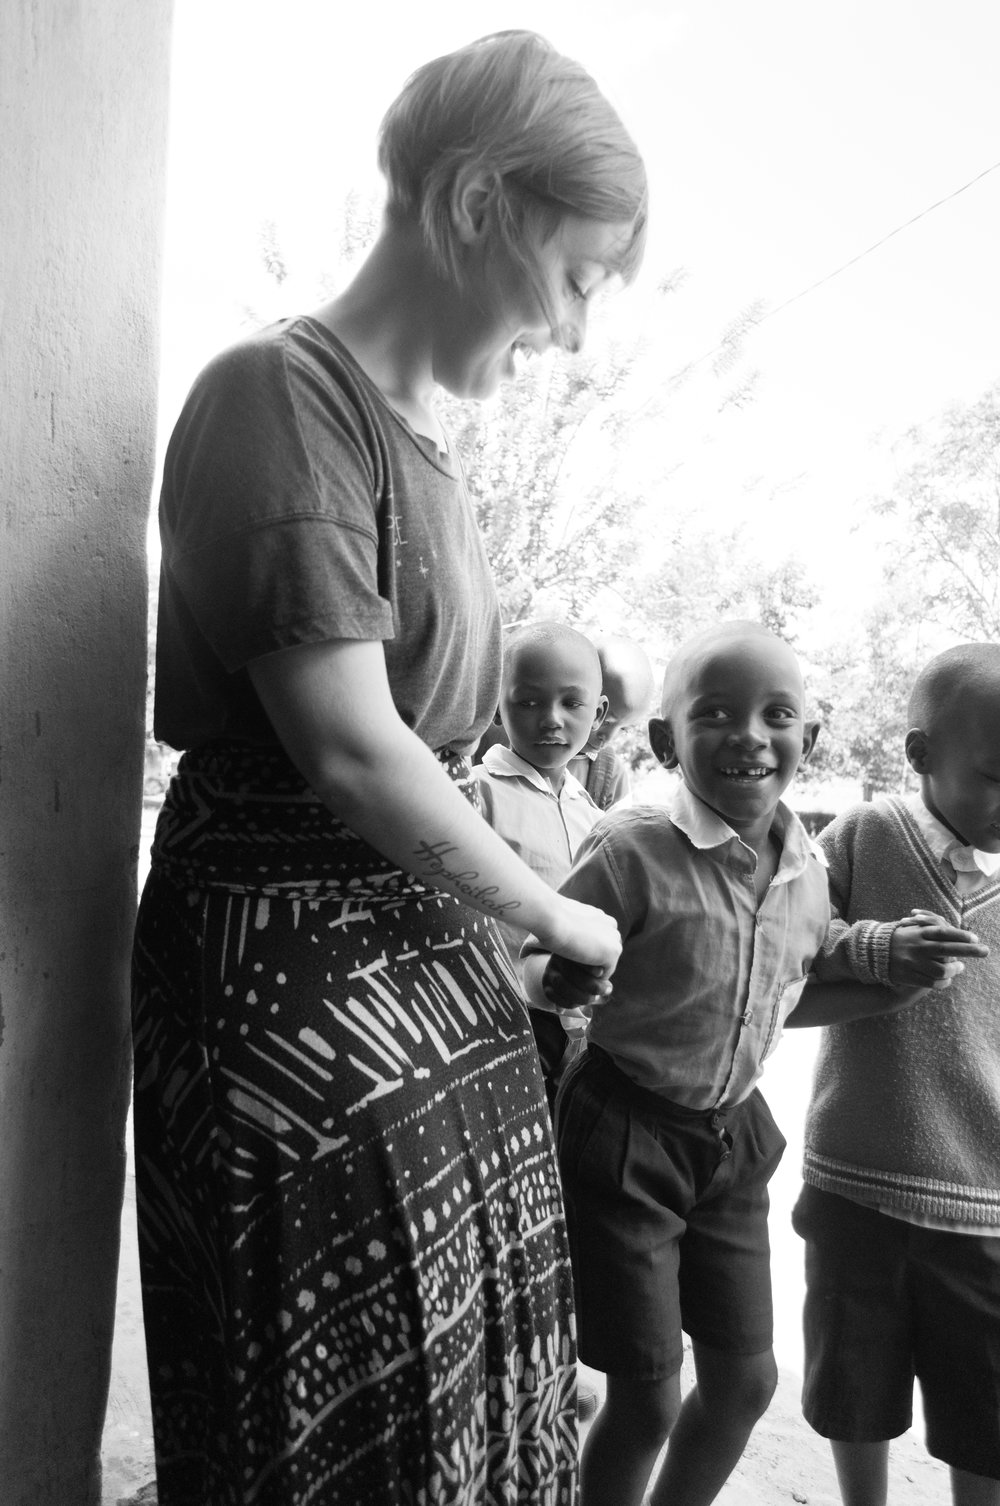 Rwanda_COTR (17 of 24).jpg